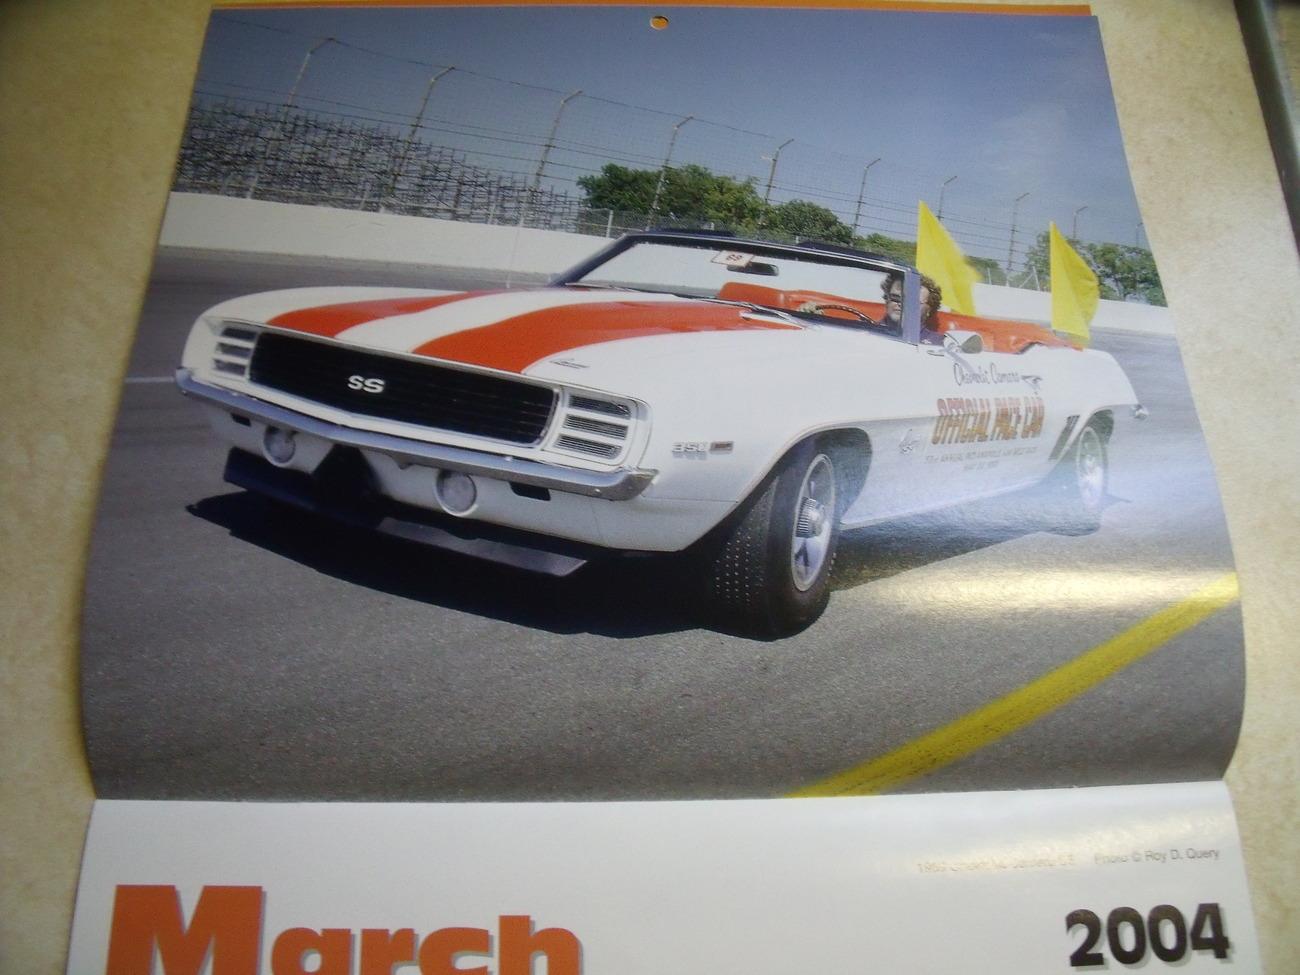 2004 NAPA Automobile Themed Calendar